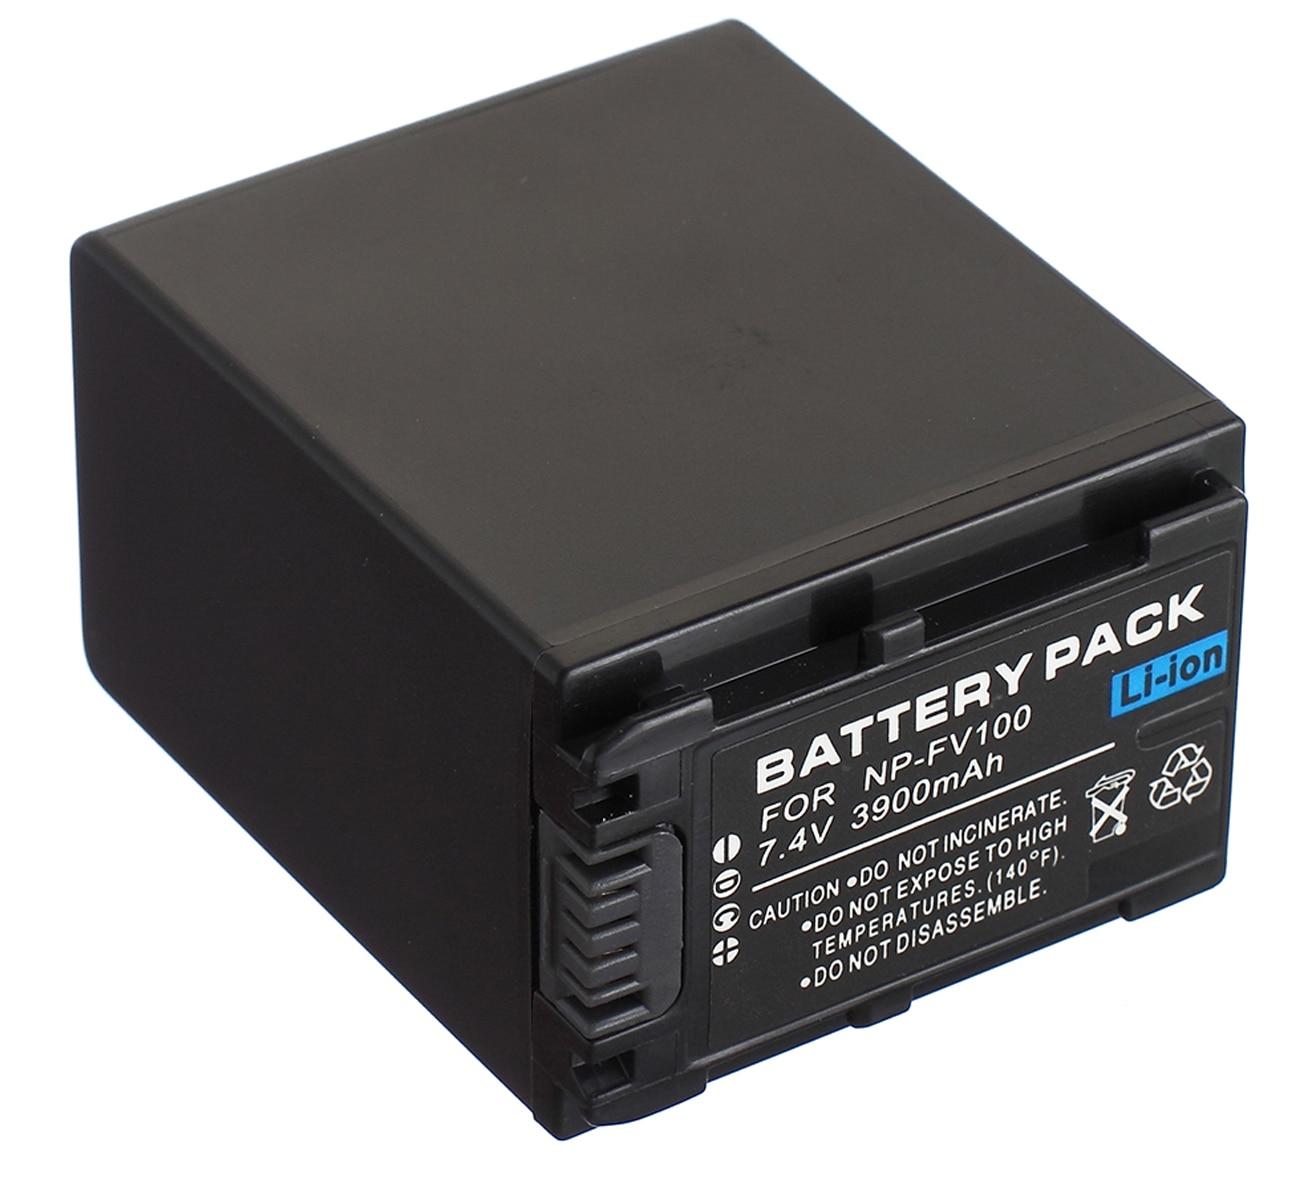 NP-FV100 Paquete de batería para Sony HDR-PJ320... HDR-PJ330... HDR-PJ340... HDR-PJ350... HDR-PJ380... HDR-PJ390...